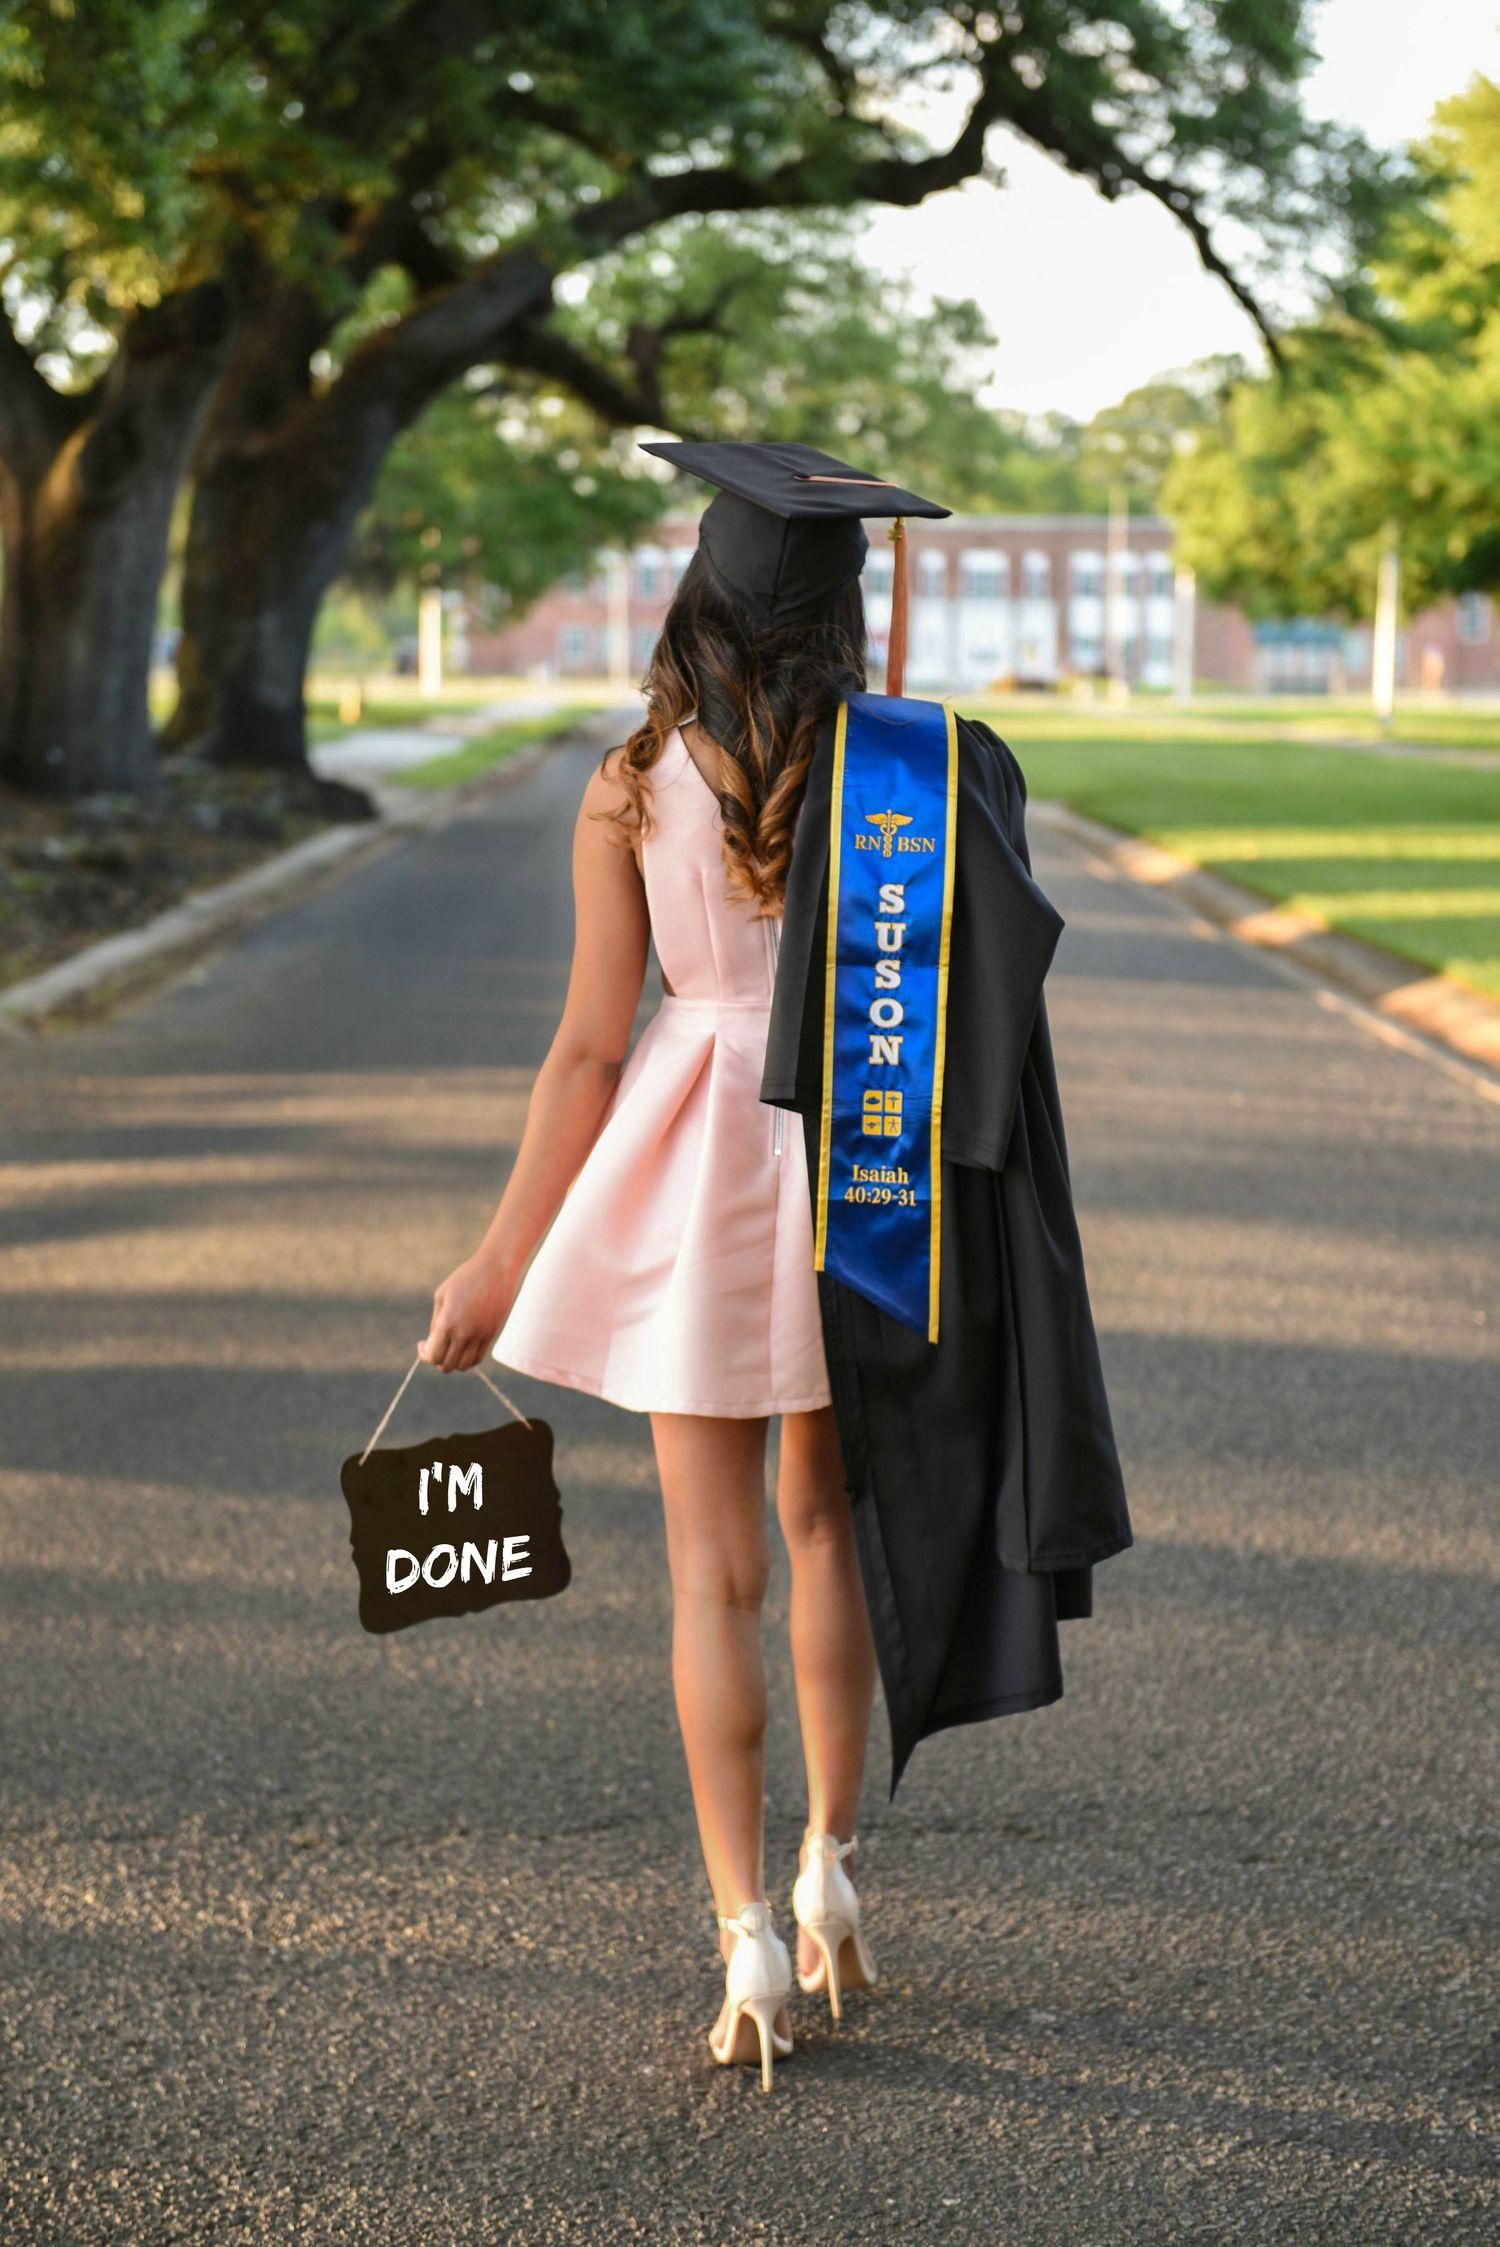 Pin on college graduation photoshoot